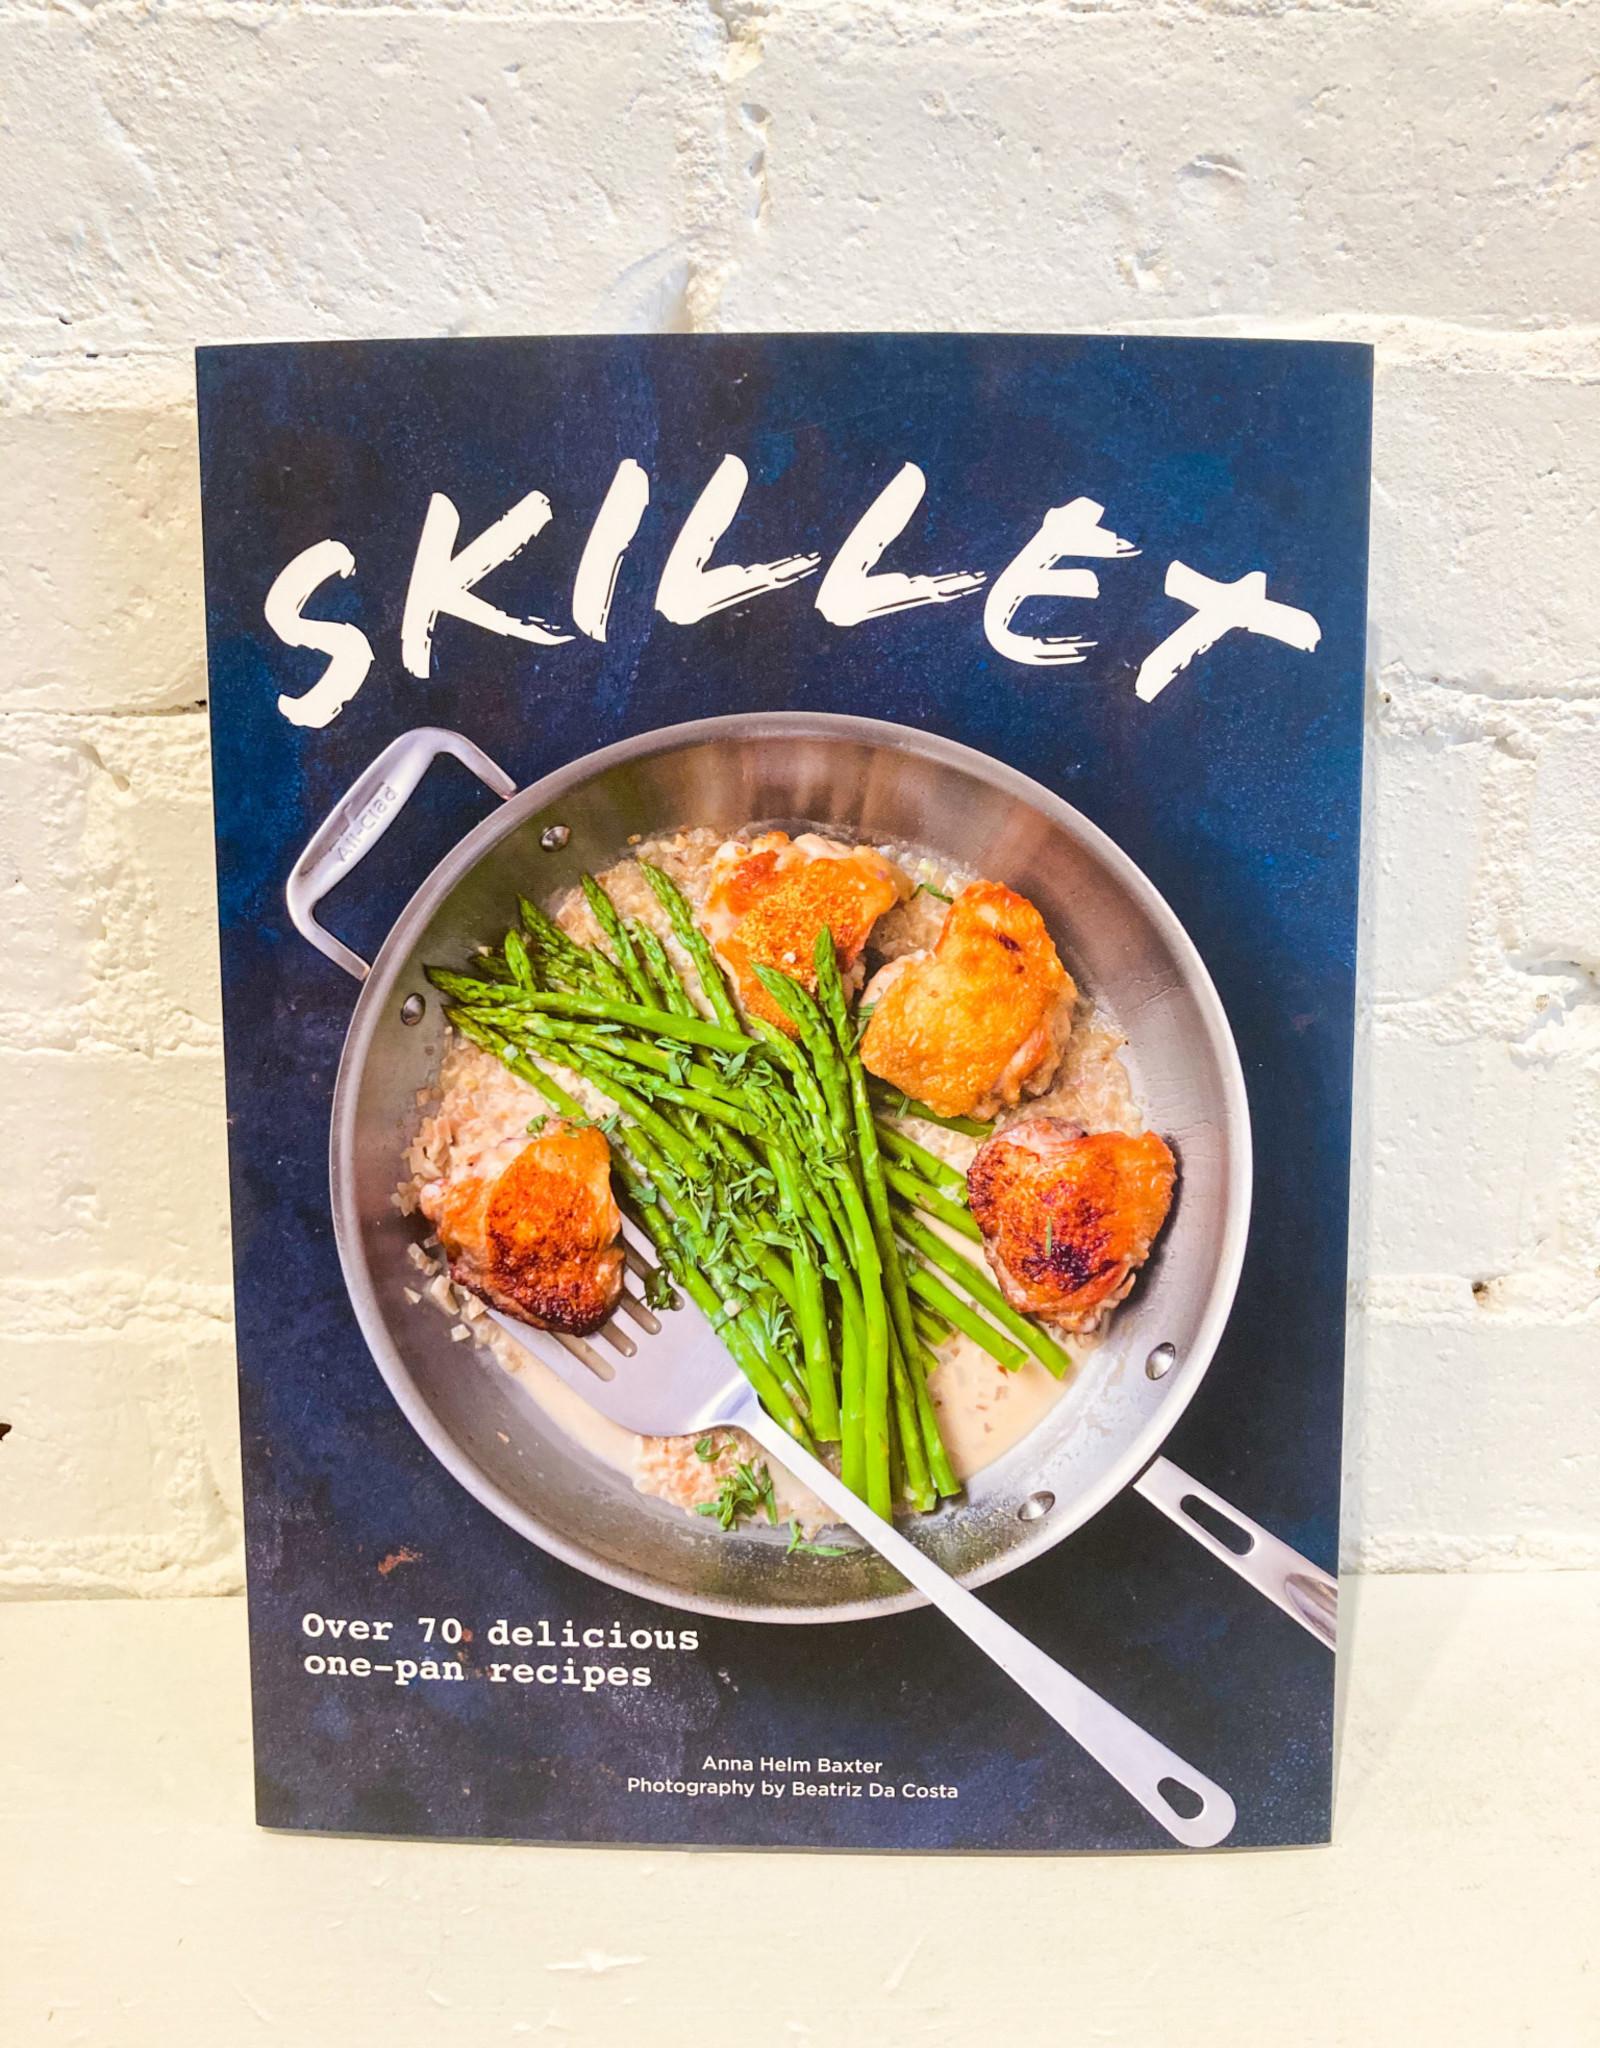 Skillet by Anna Helm Baxter